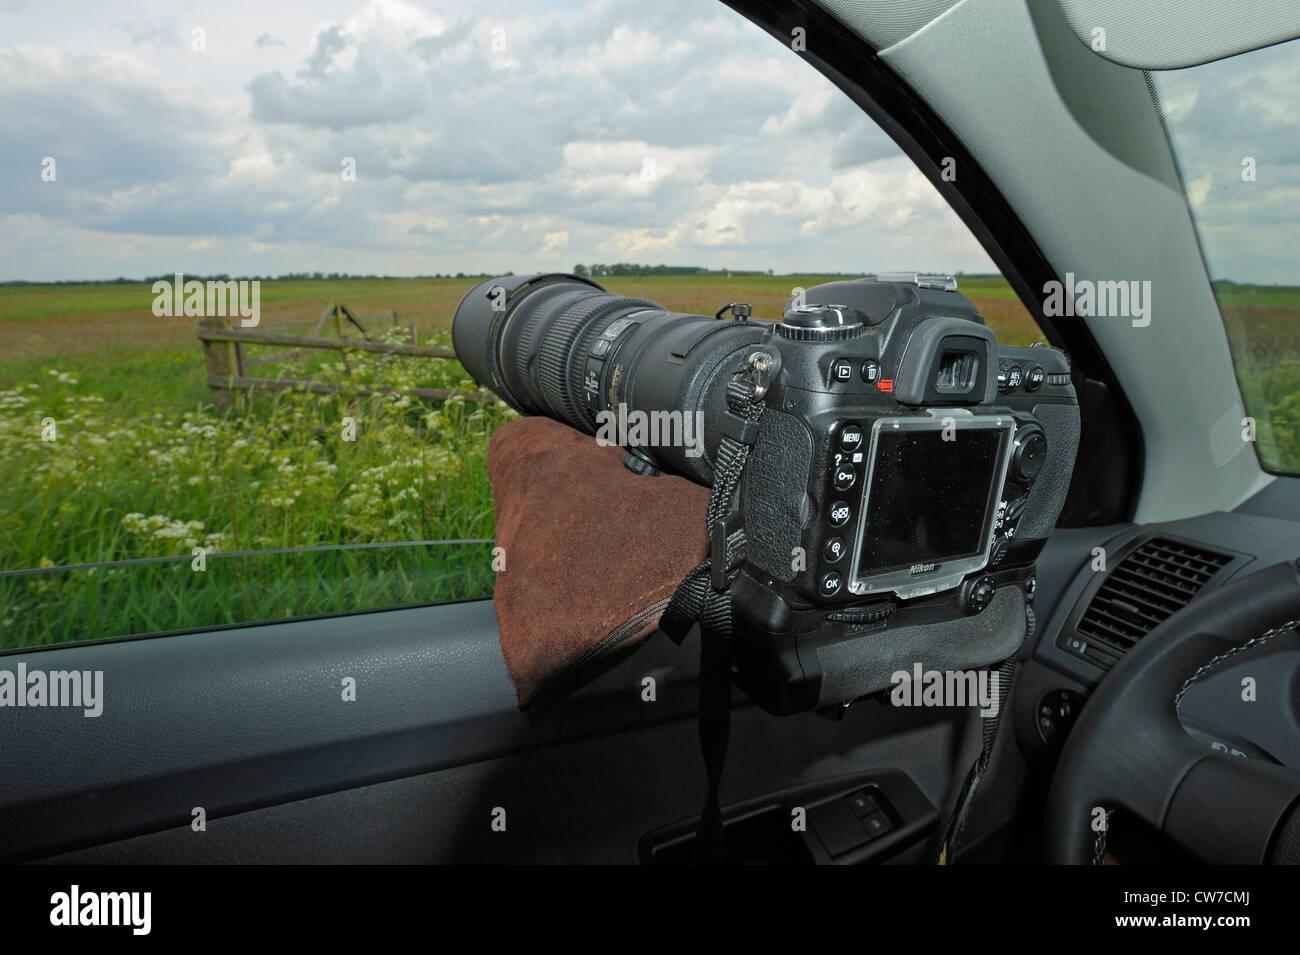 photo camera on bean bag lying in open window of a car, Netherlands, Nijkerk - Stock Image